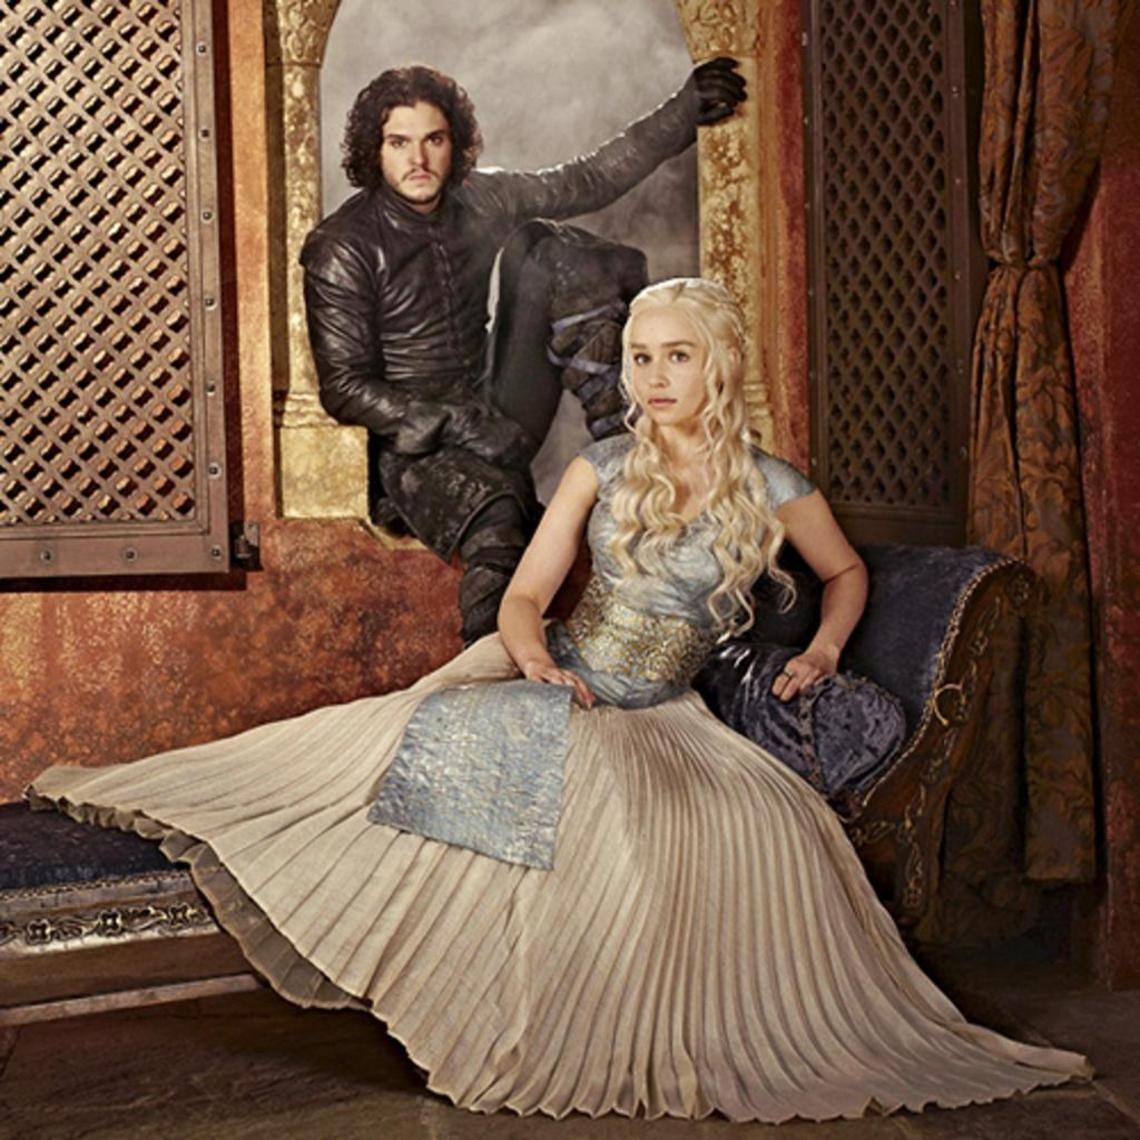 Game of Thrones Daenerys Targaryen & Jon Snow